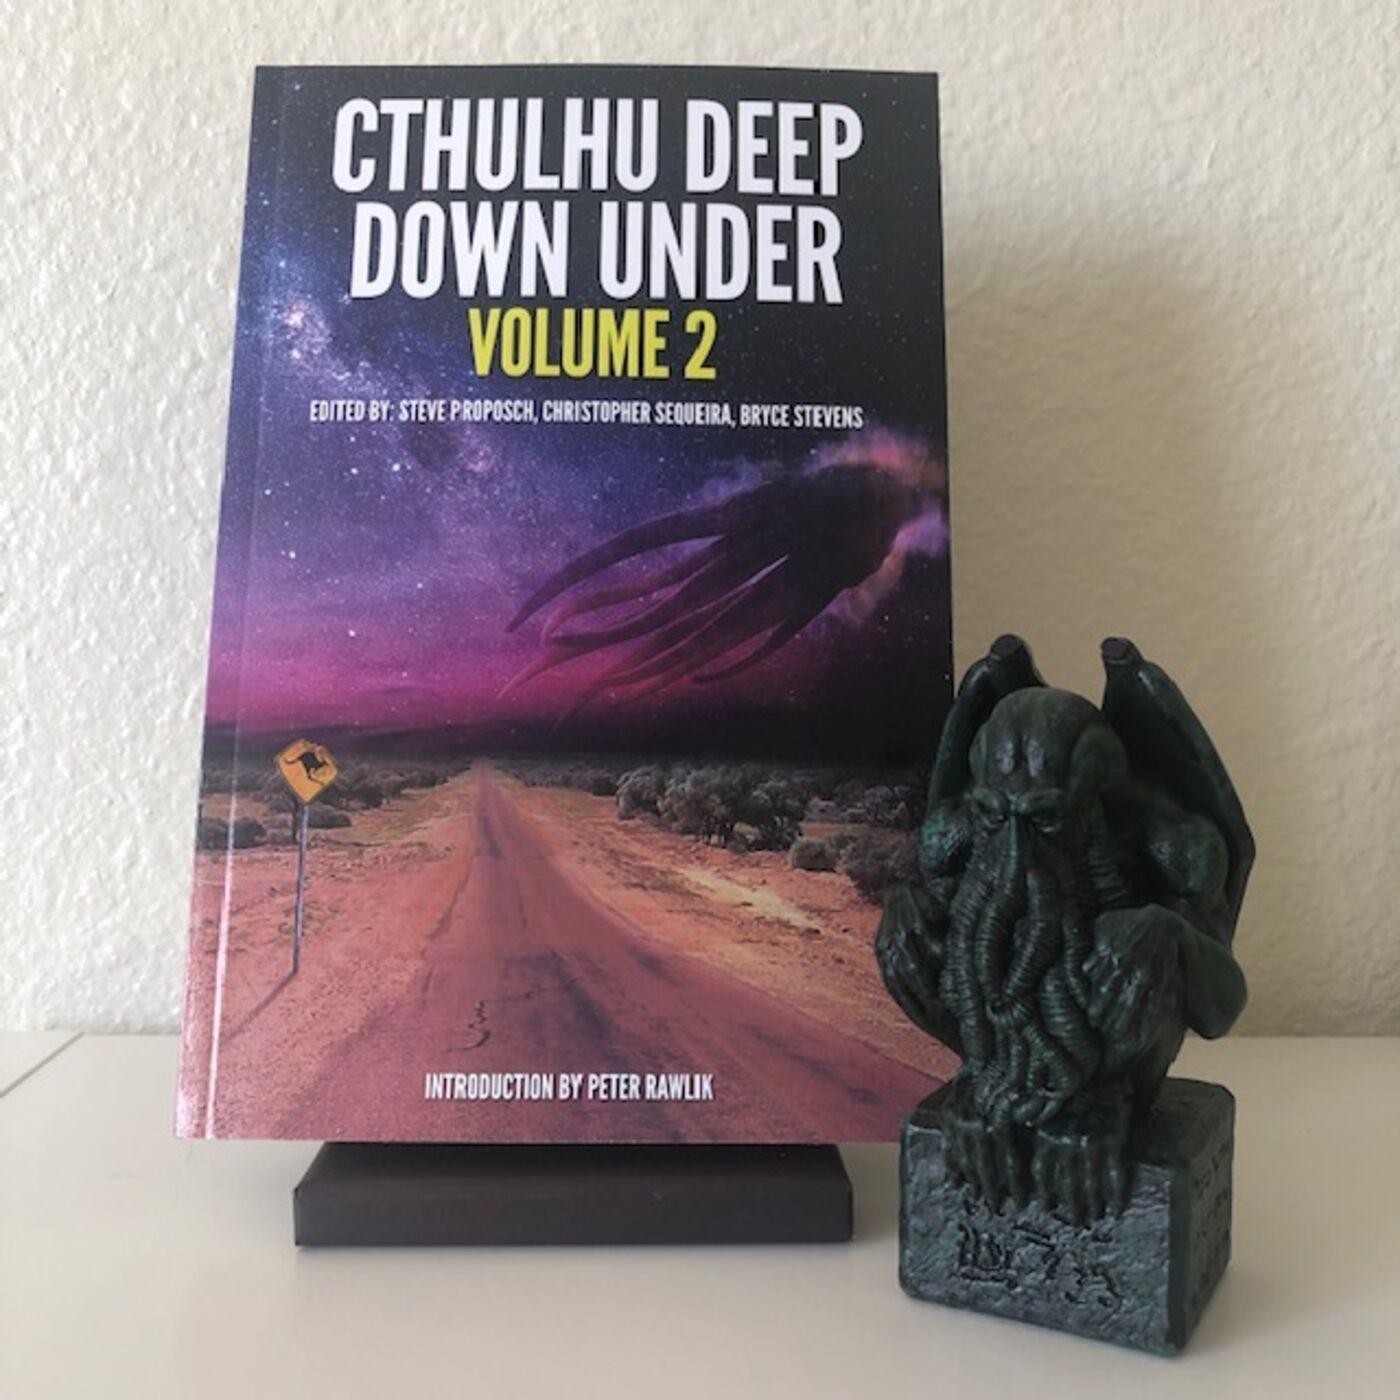 Ep 36 - Cthulhu Deep Down Under Volume 2